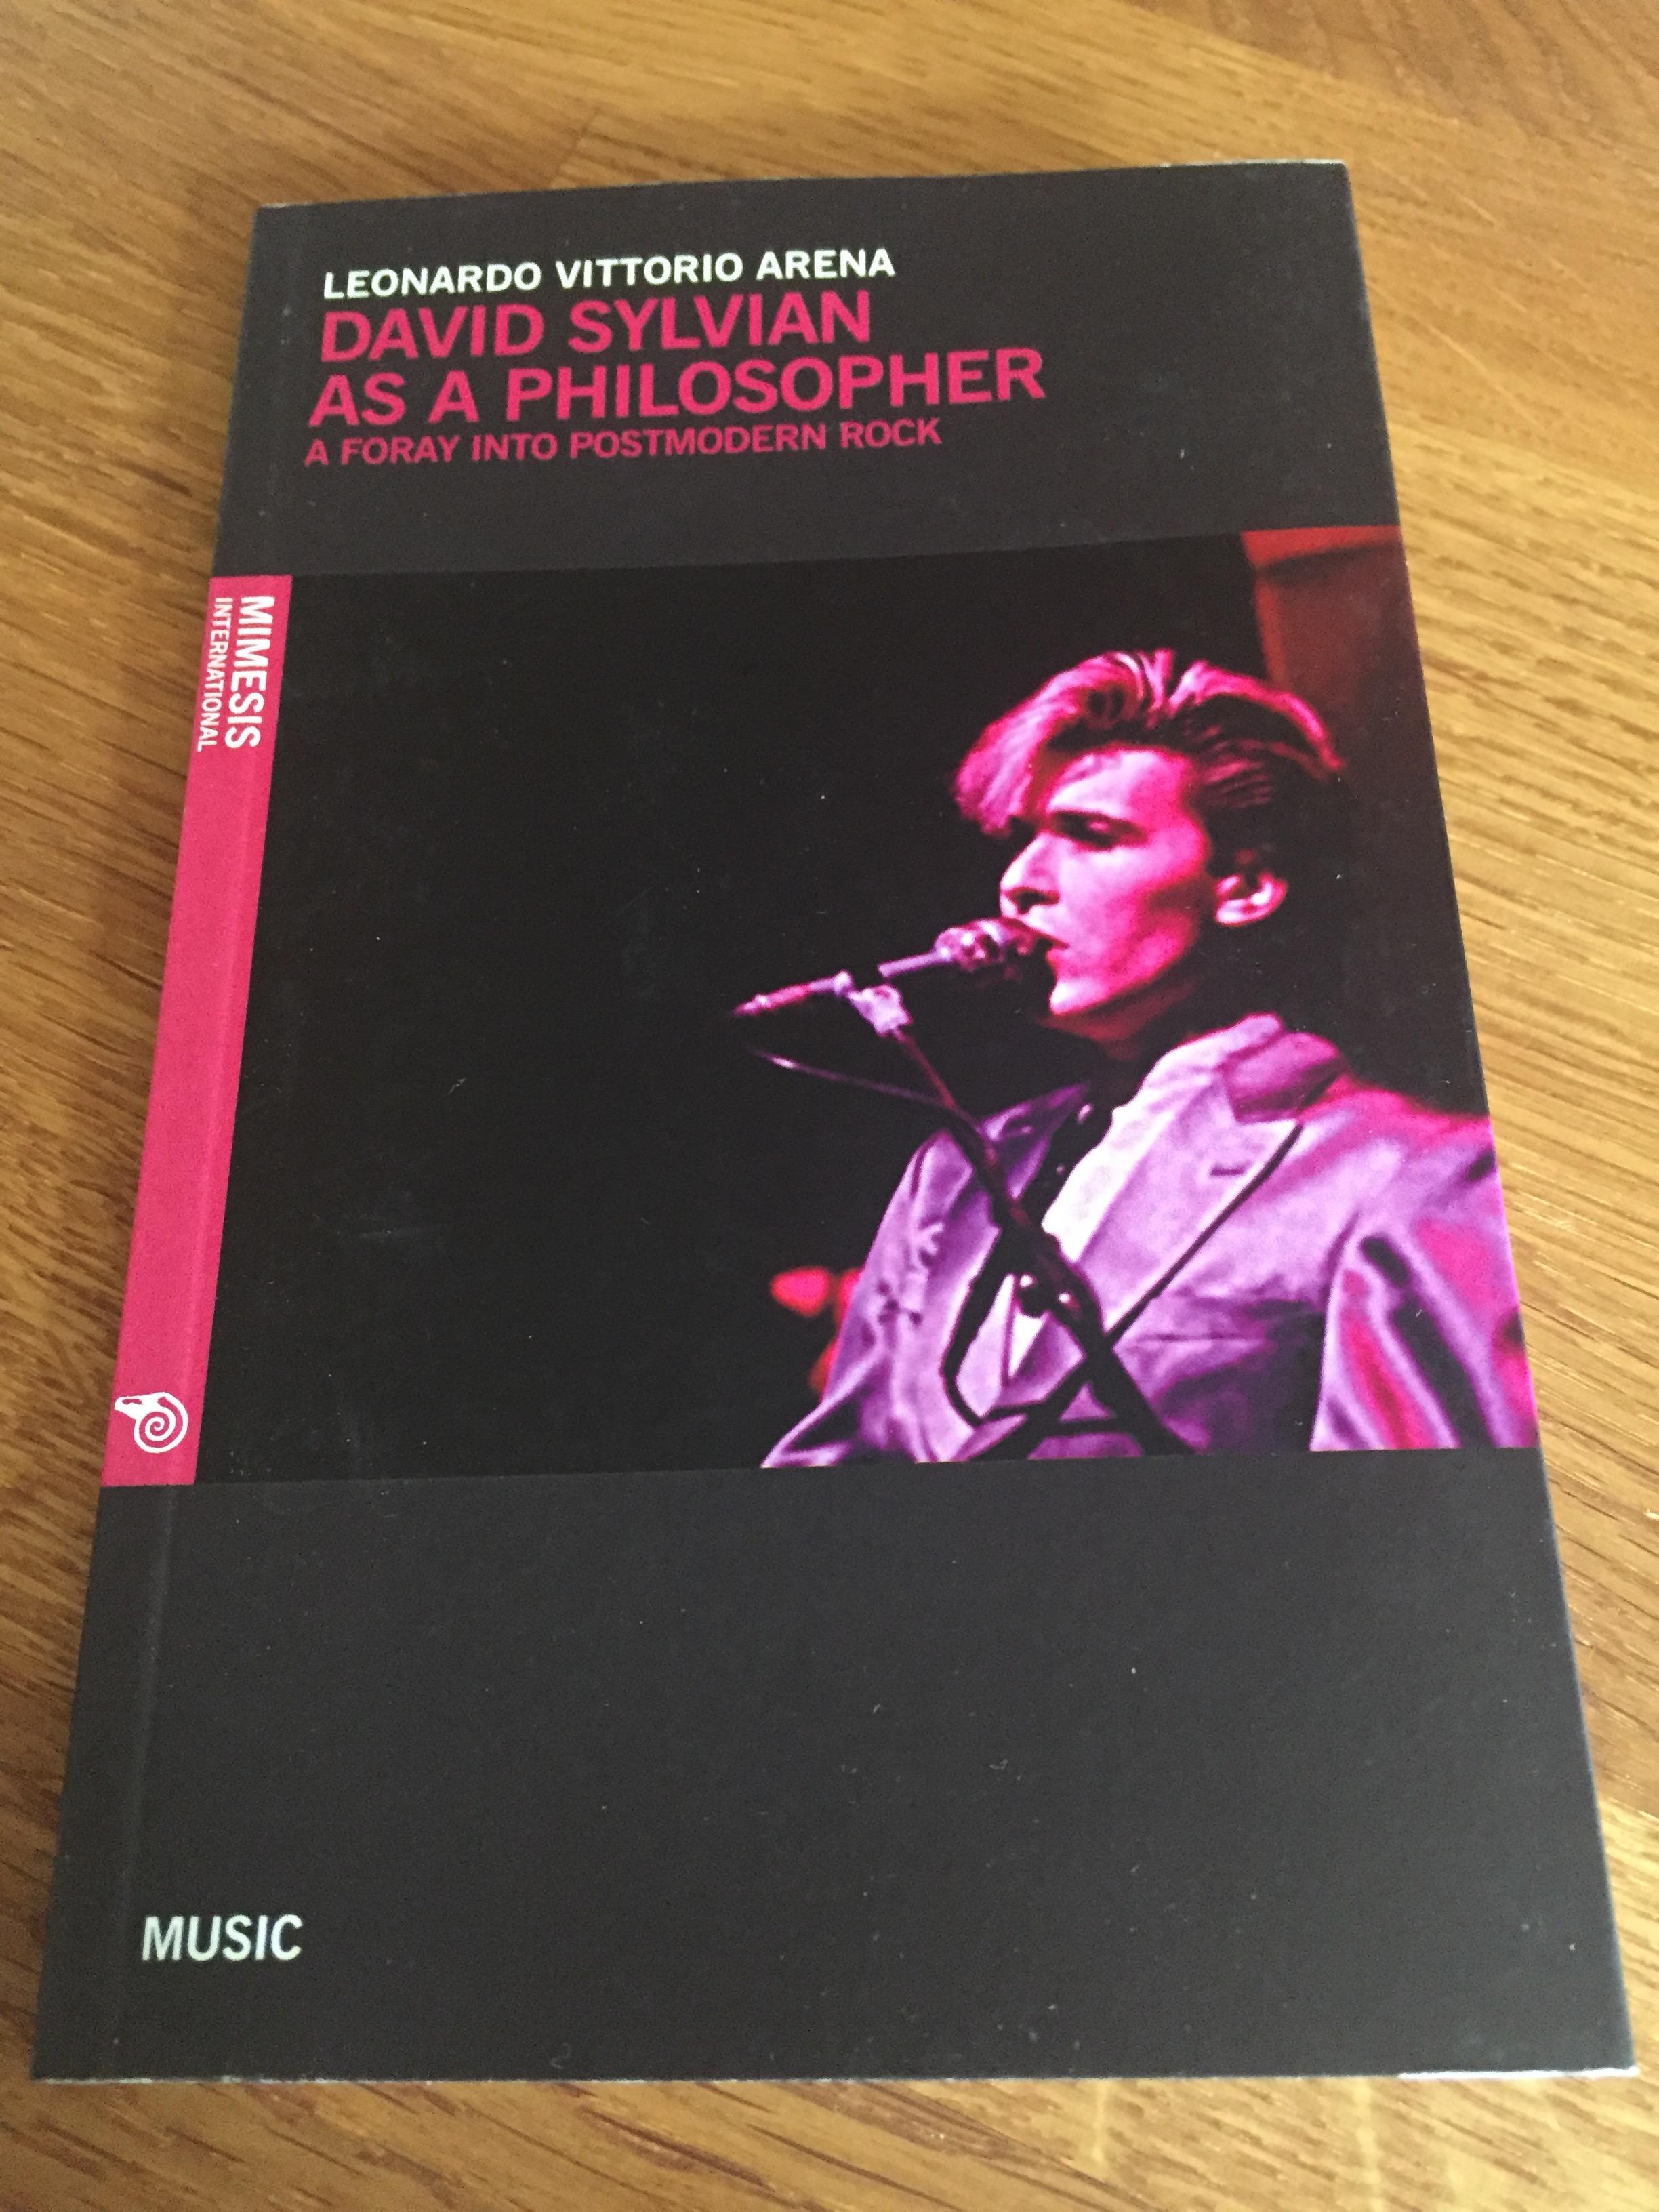 David Sylvian as Philosopher